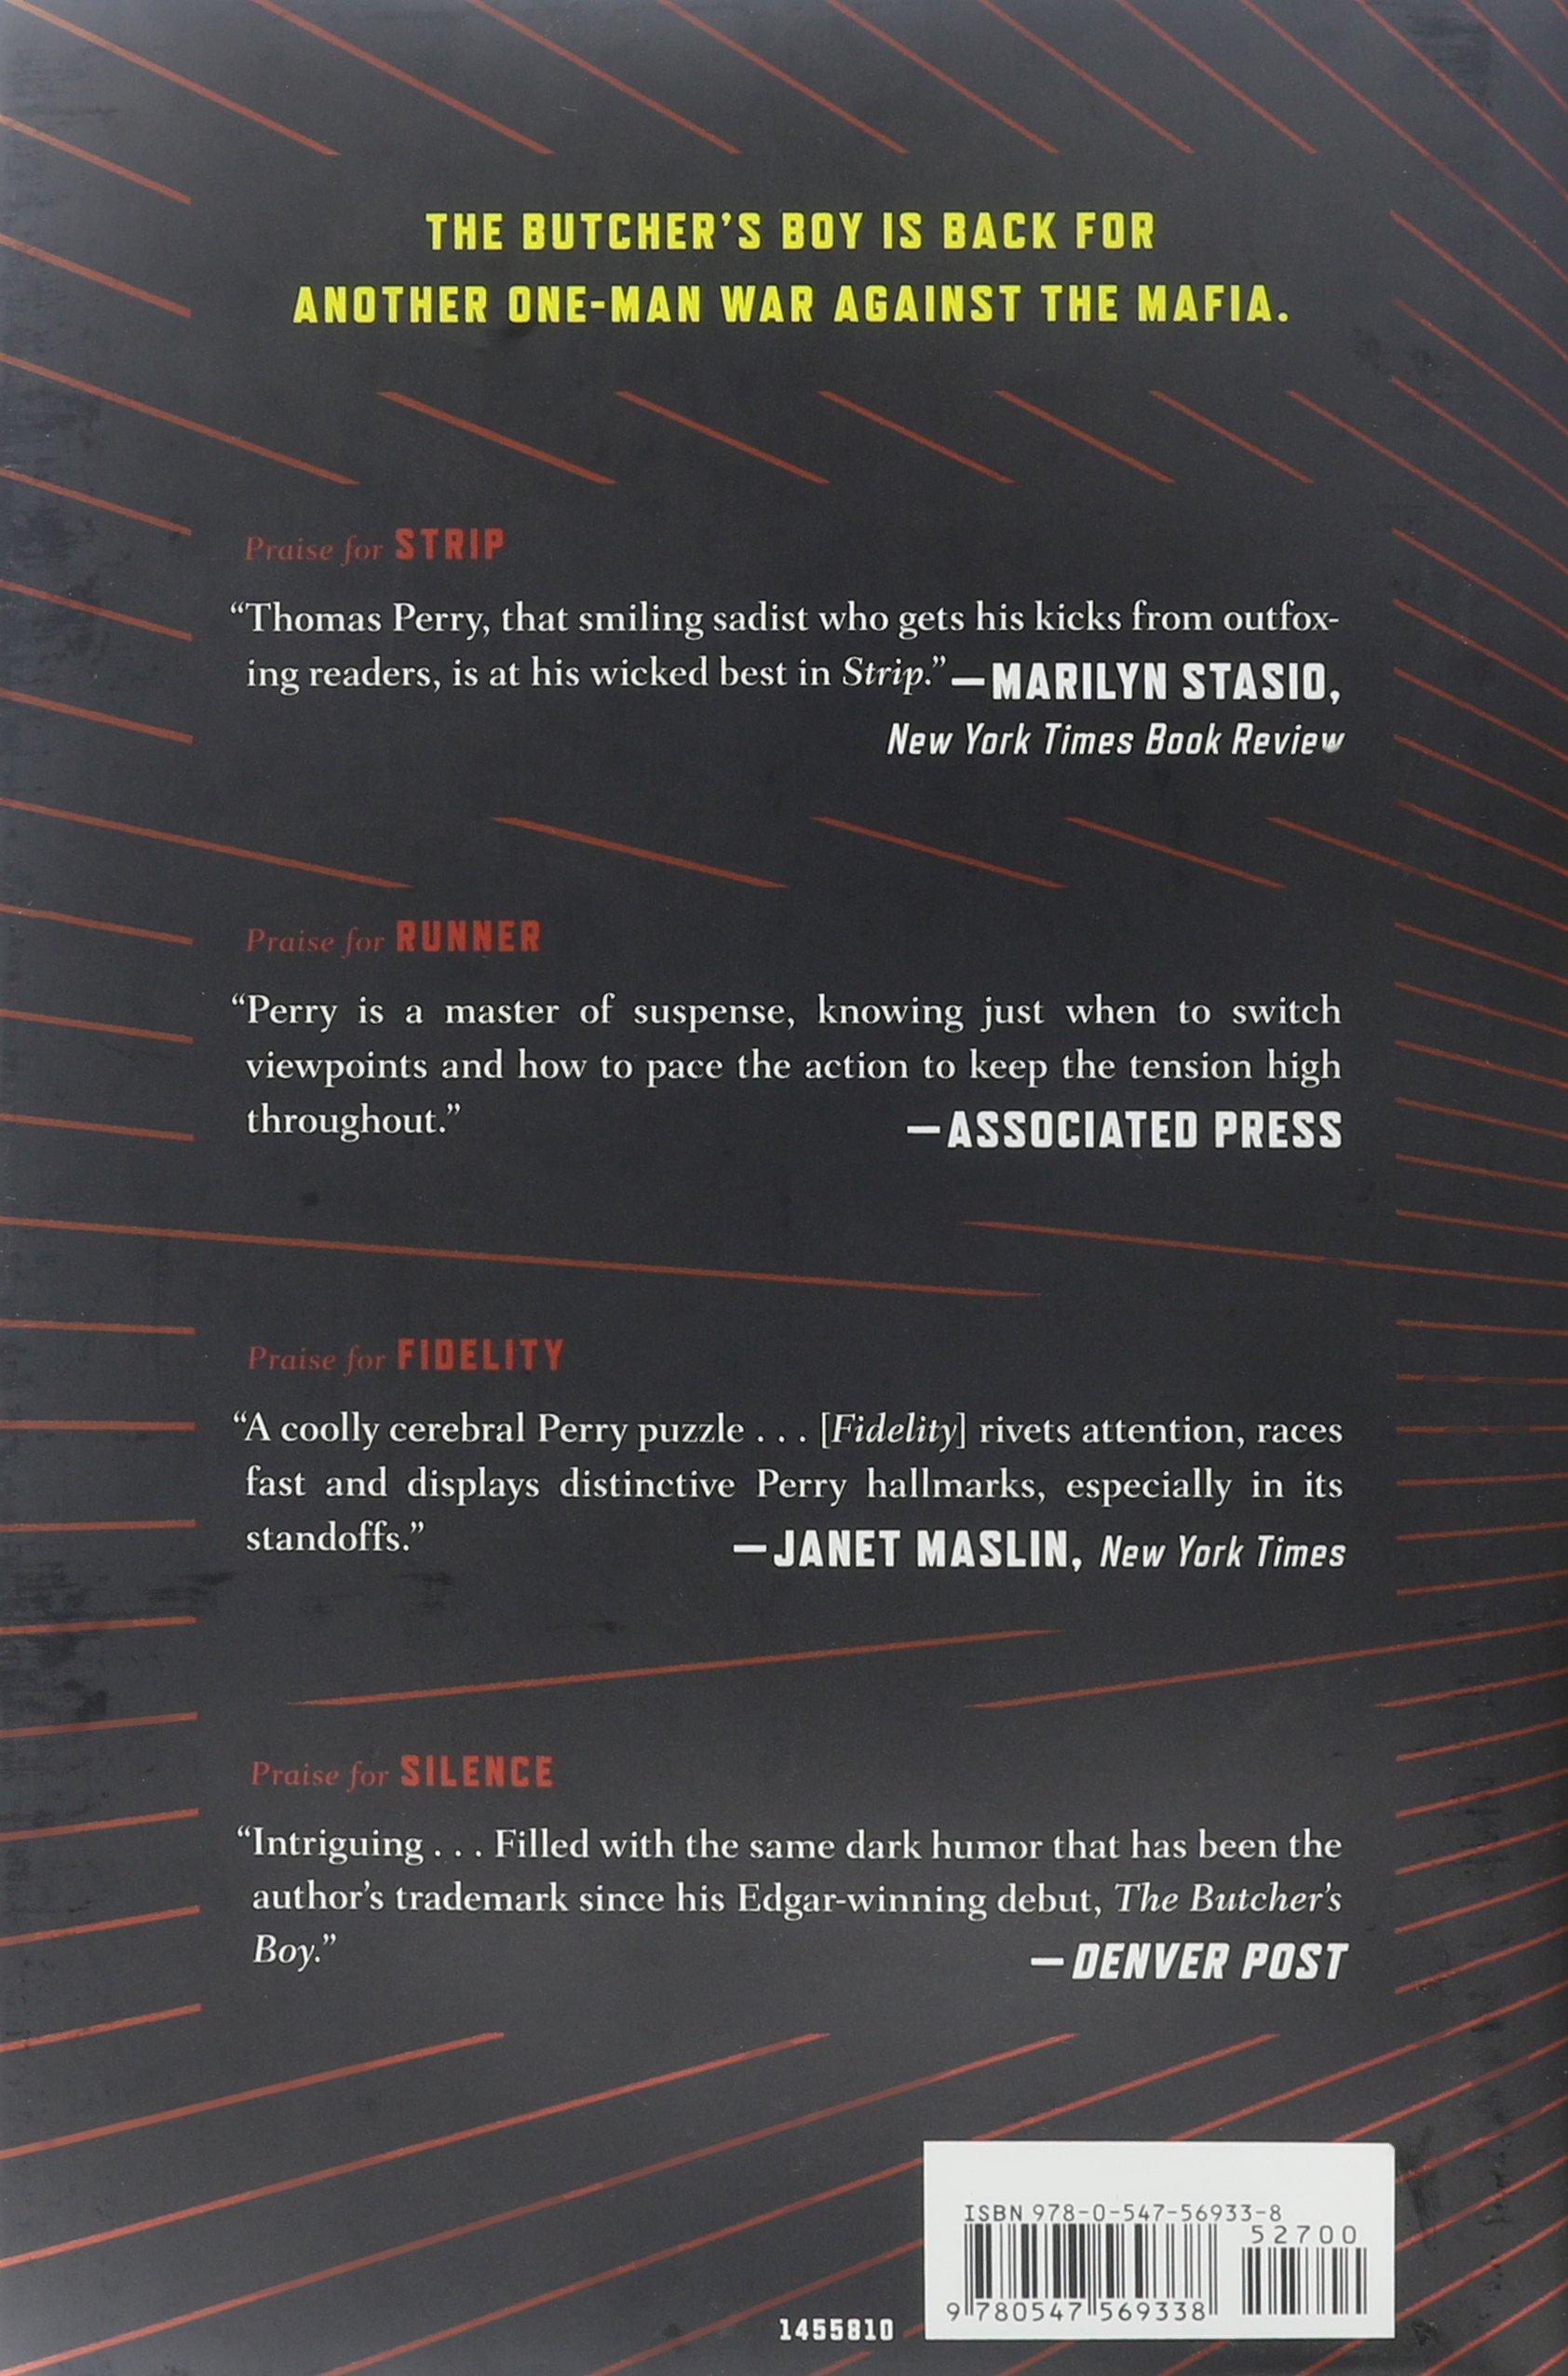 The Informant: An Otto Penzler Book (Butchers Boy): Amazon ...